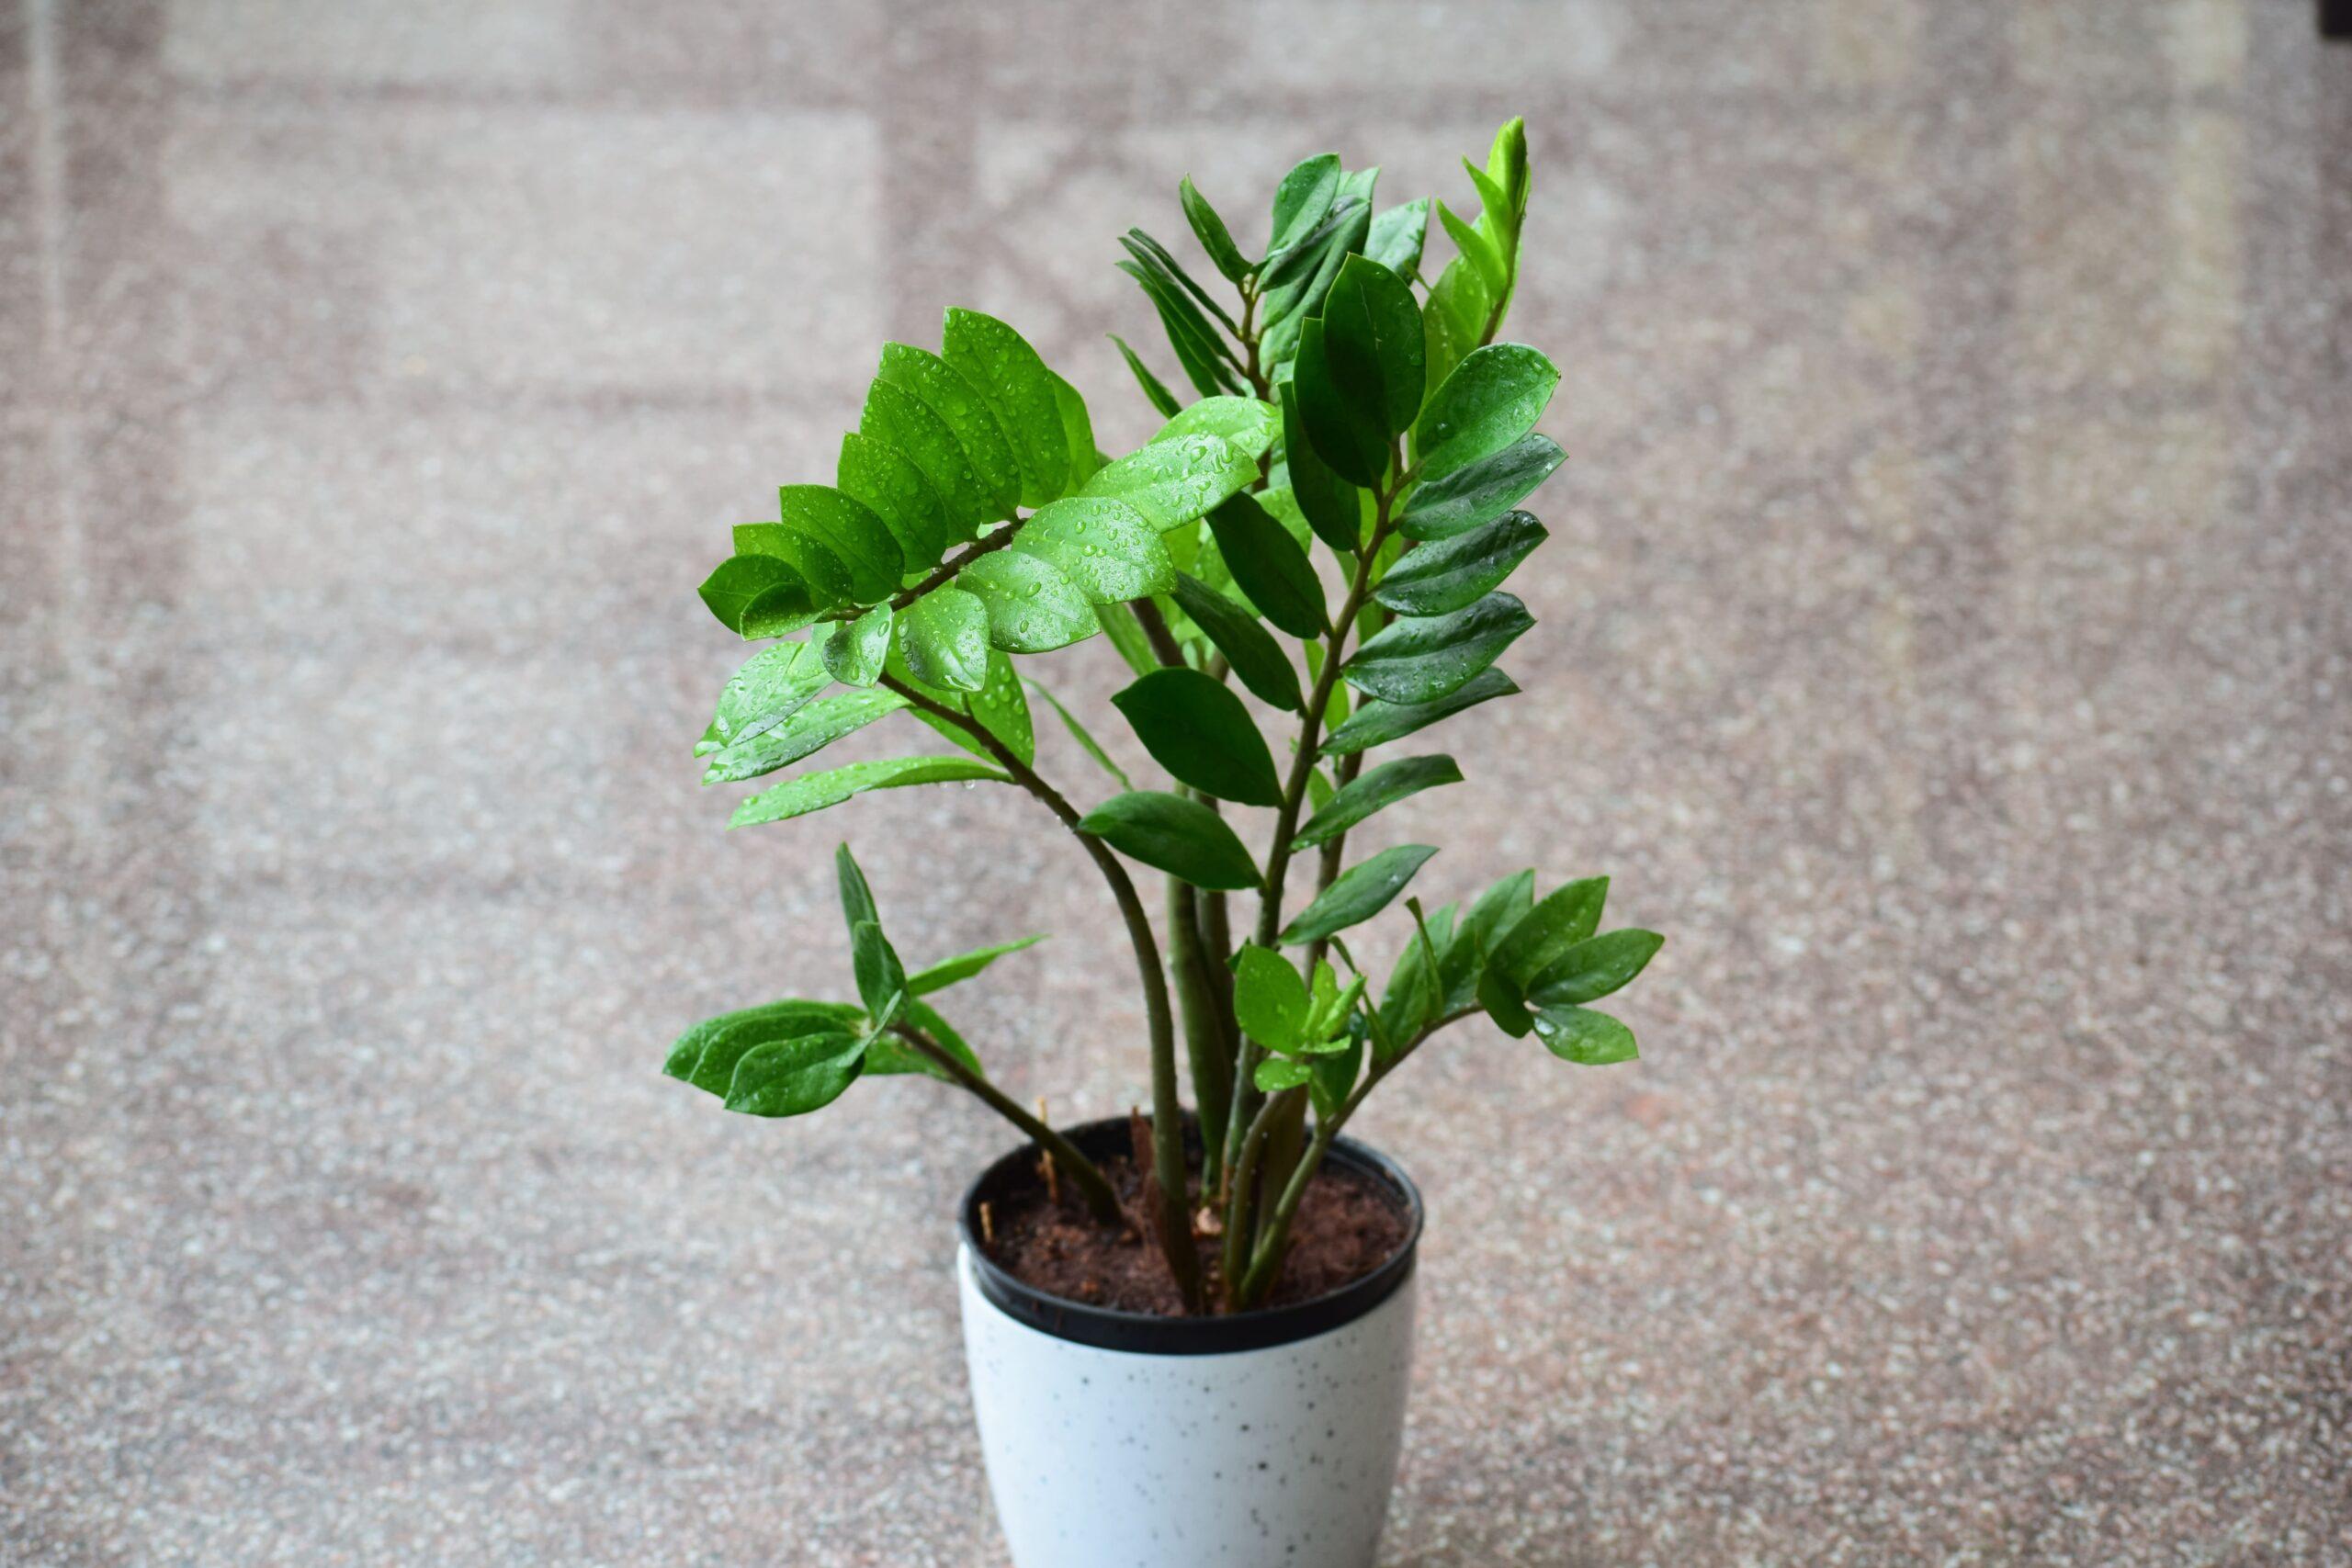 L'arrosage de la plante verte zamioculcas